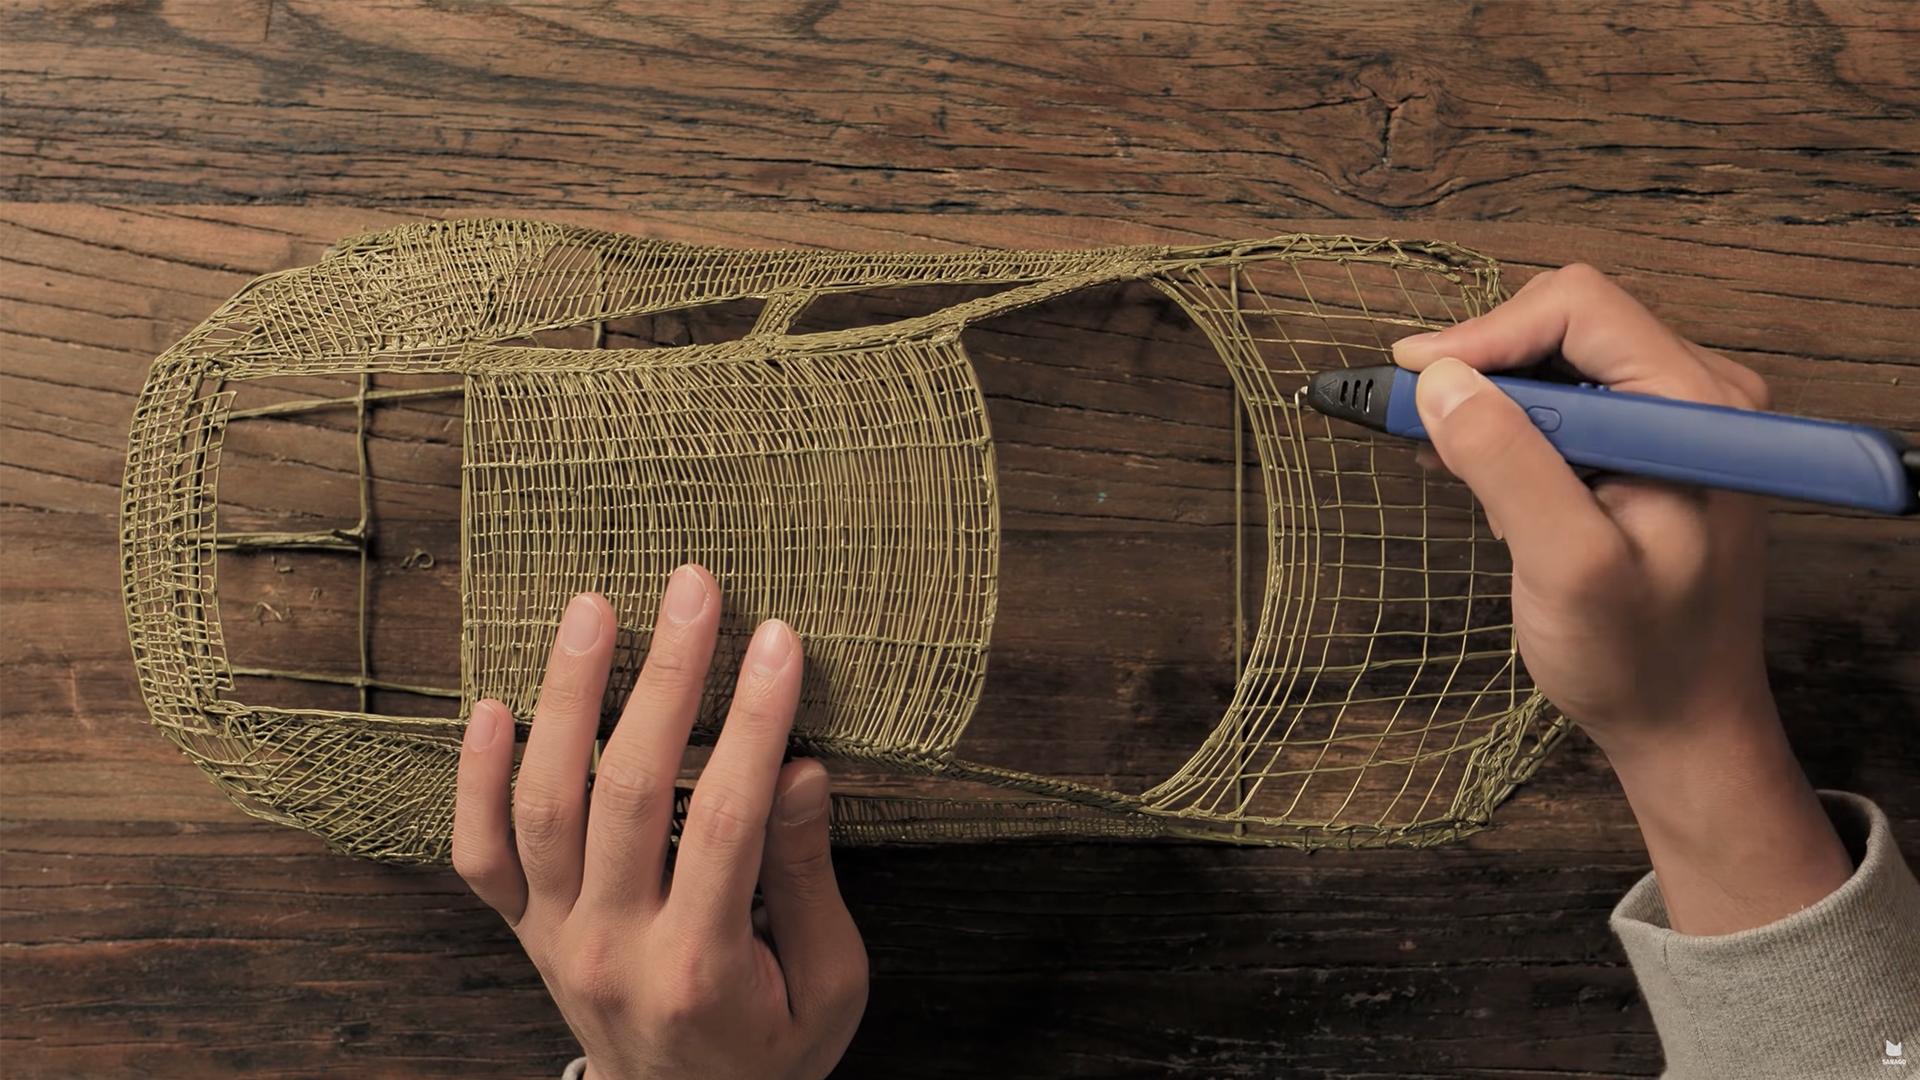 The experienced YouTuber 'draws' a Porsche RC car to life with a 3D pen